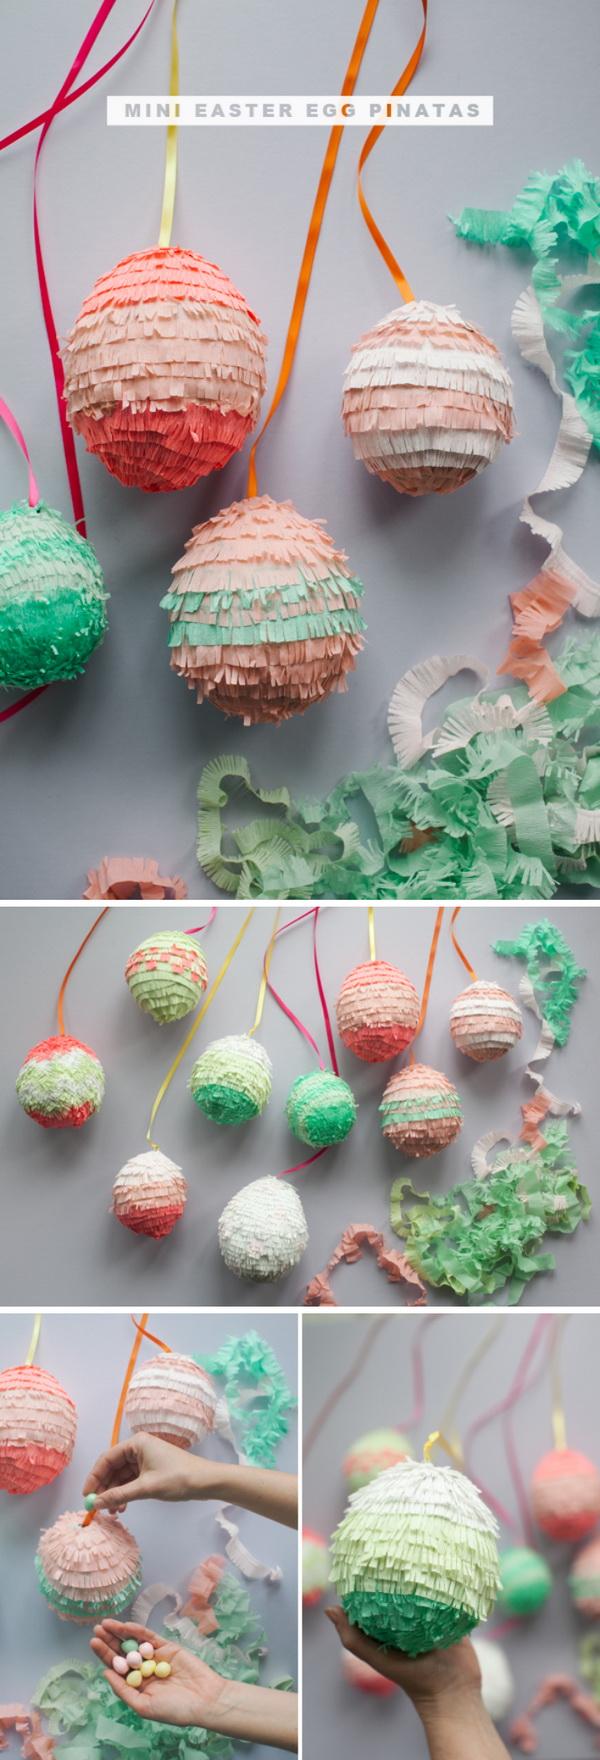 DIY Easter Decoration Ideas: DIY Mini Easter Egg Pinatas.